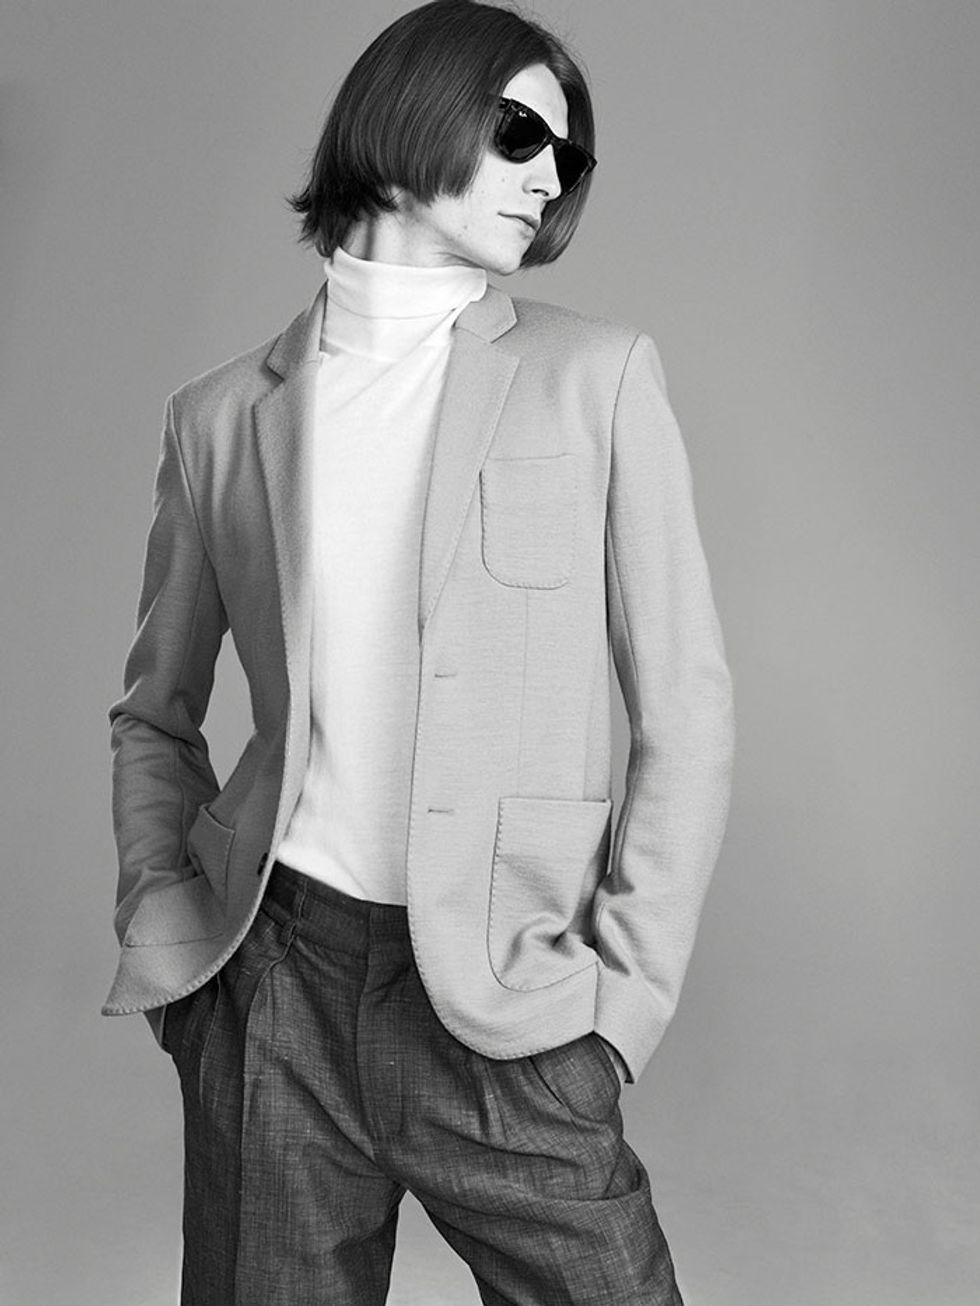 Model Crush Monday: Timothee Bertoni